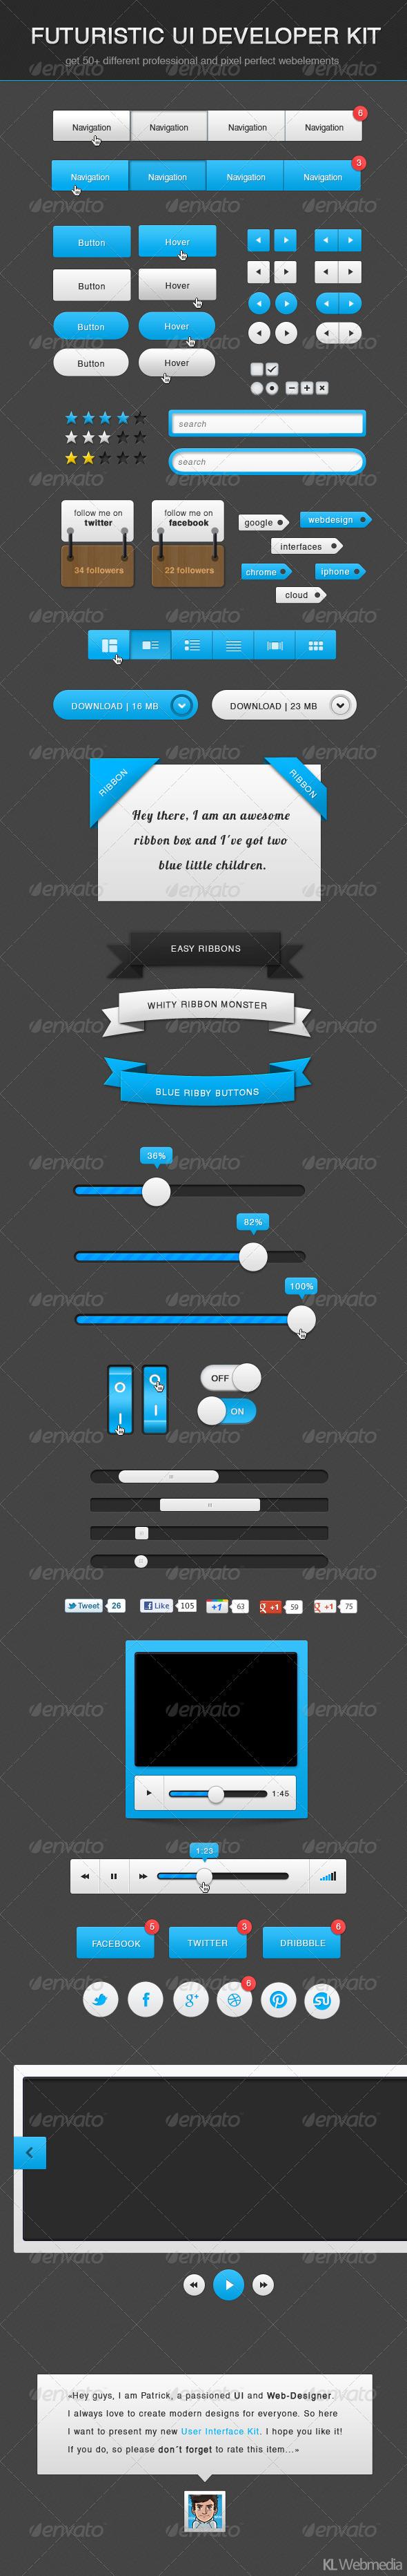 Futuristic Developer UI Kit by KL-Webmedia